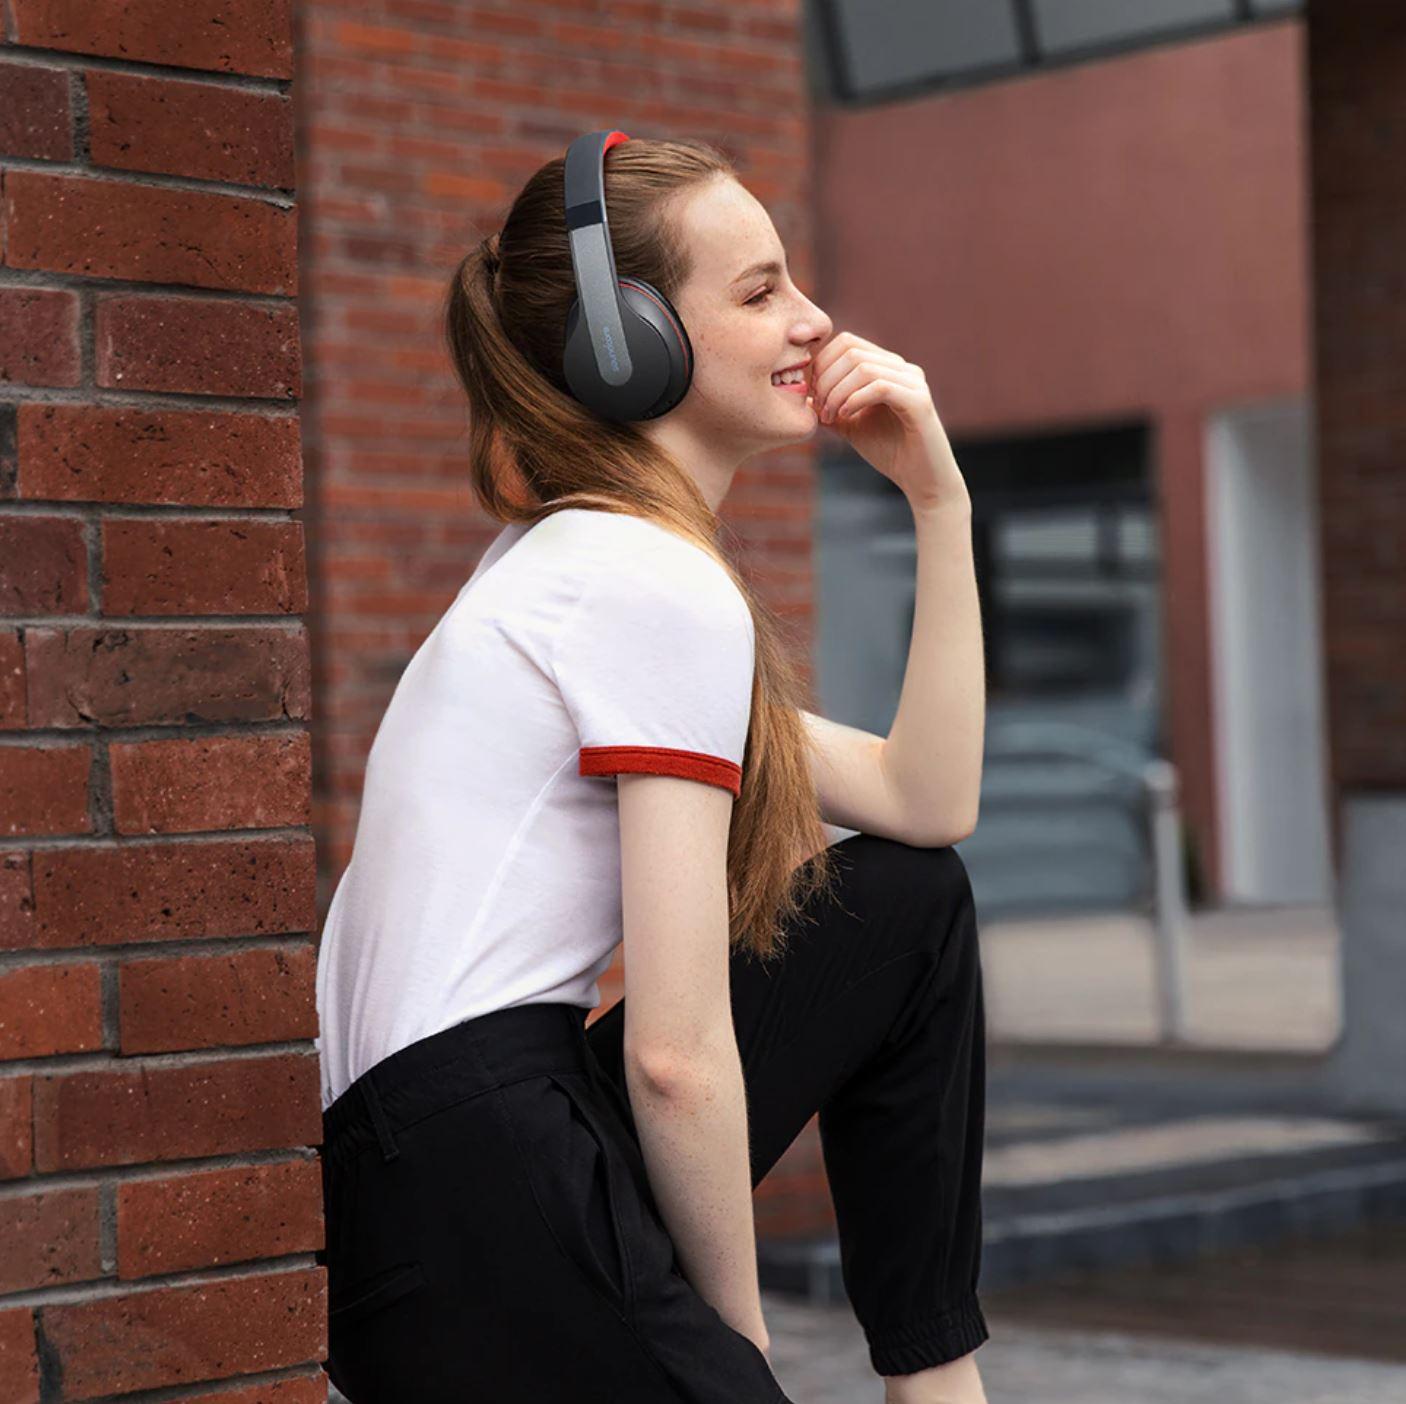 Święto marki Anker na Aliexpress - Anker Soundcore Life Q10 Wireless Bluetooth Headphones